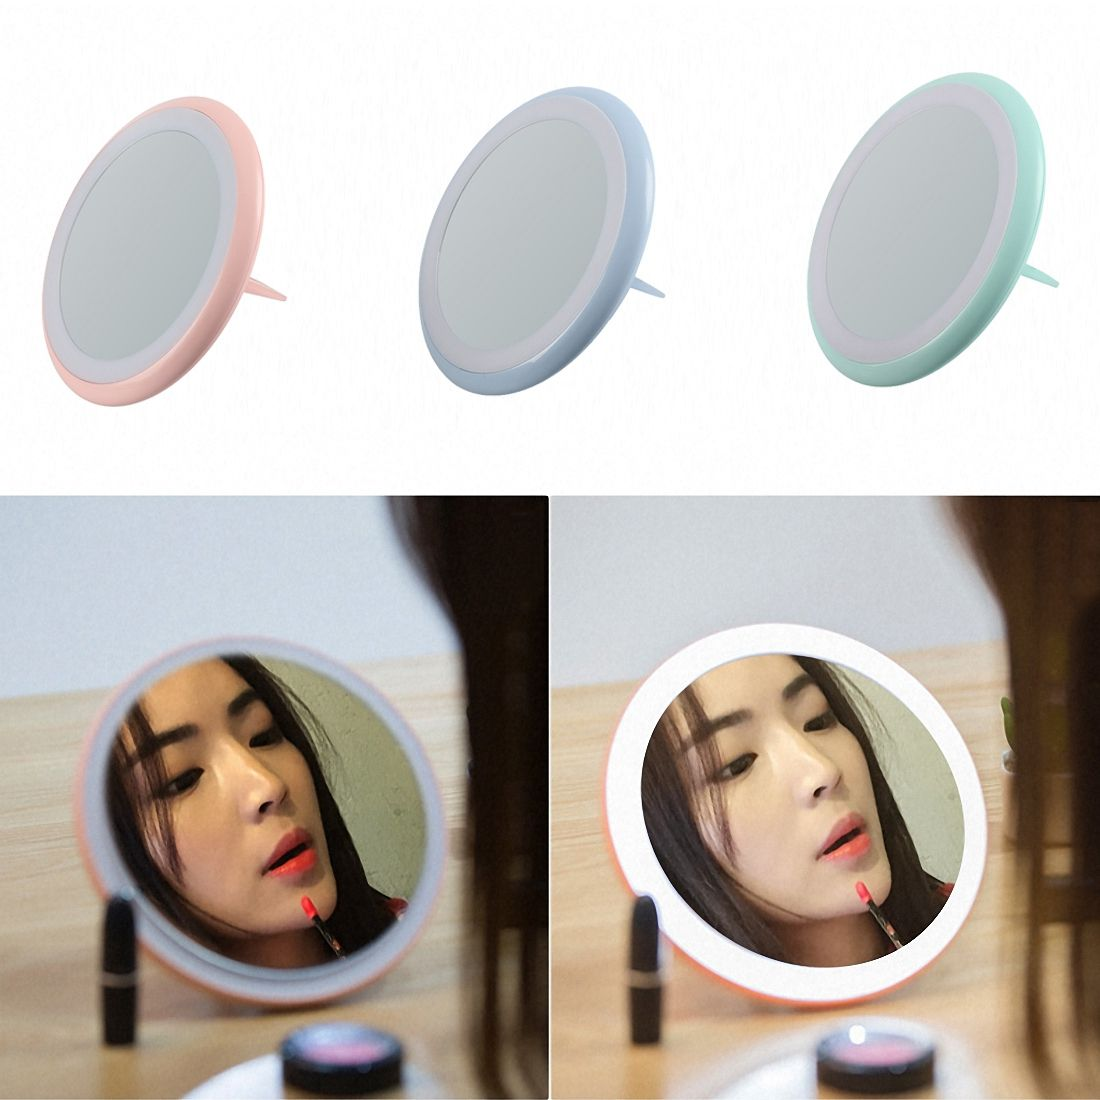 Vanity Lights Portable Lighted Makeup Mirror Vanity Led Light Kit Usb Charging Cosmetic Lighted Make Up Mirrors Bulb Brightness Vanity Lights Elegant Shape